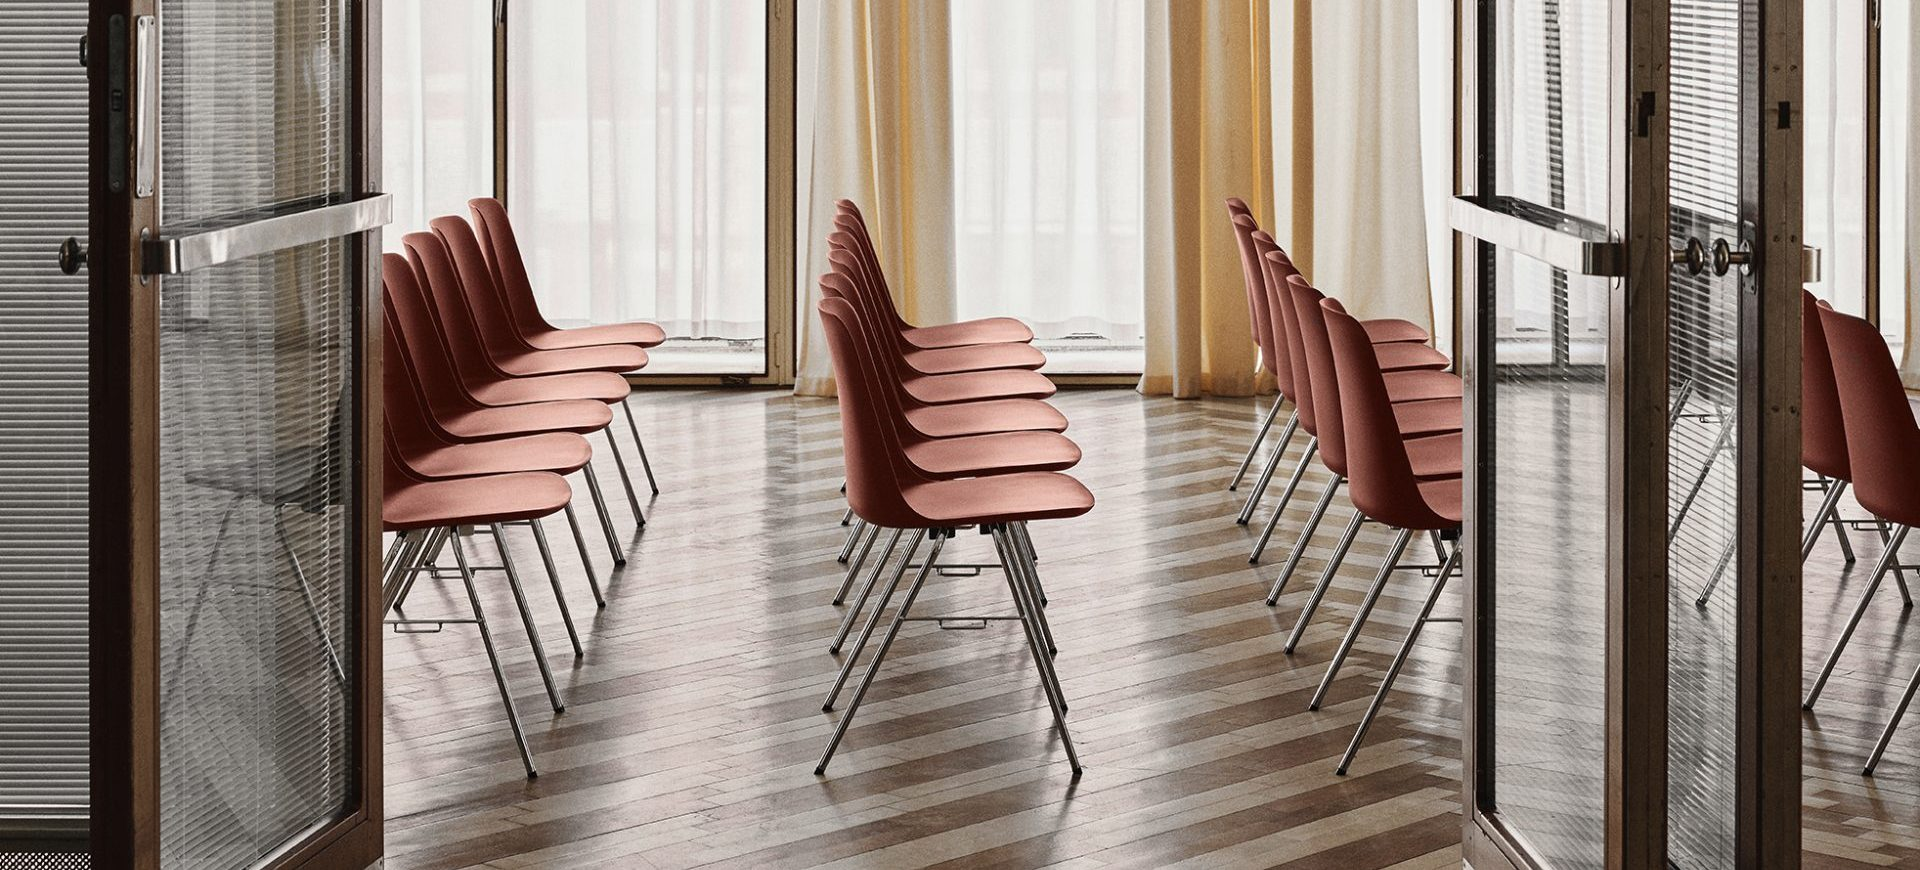 Duurzame stoel